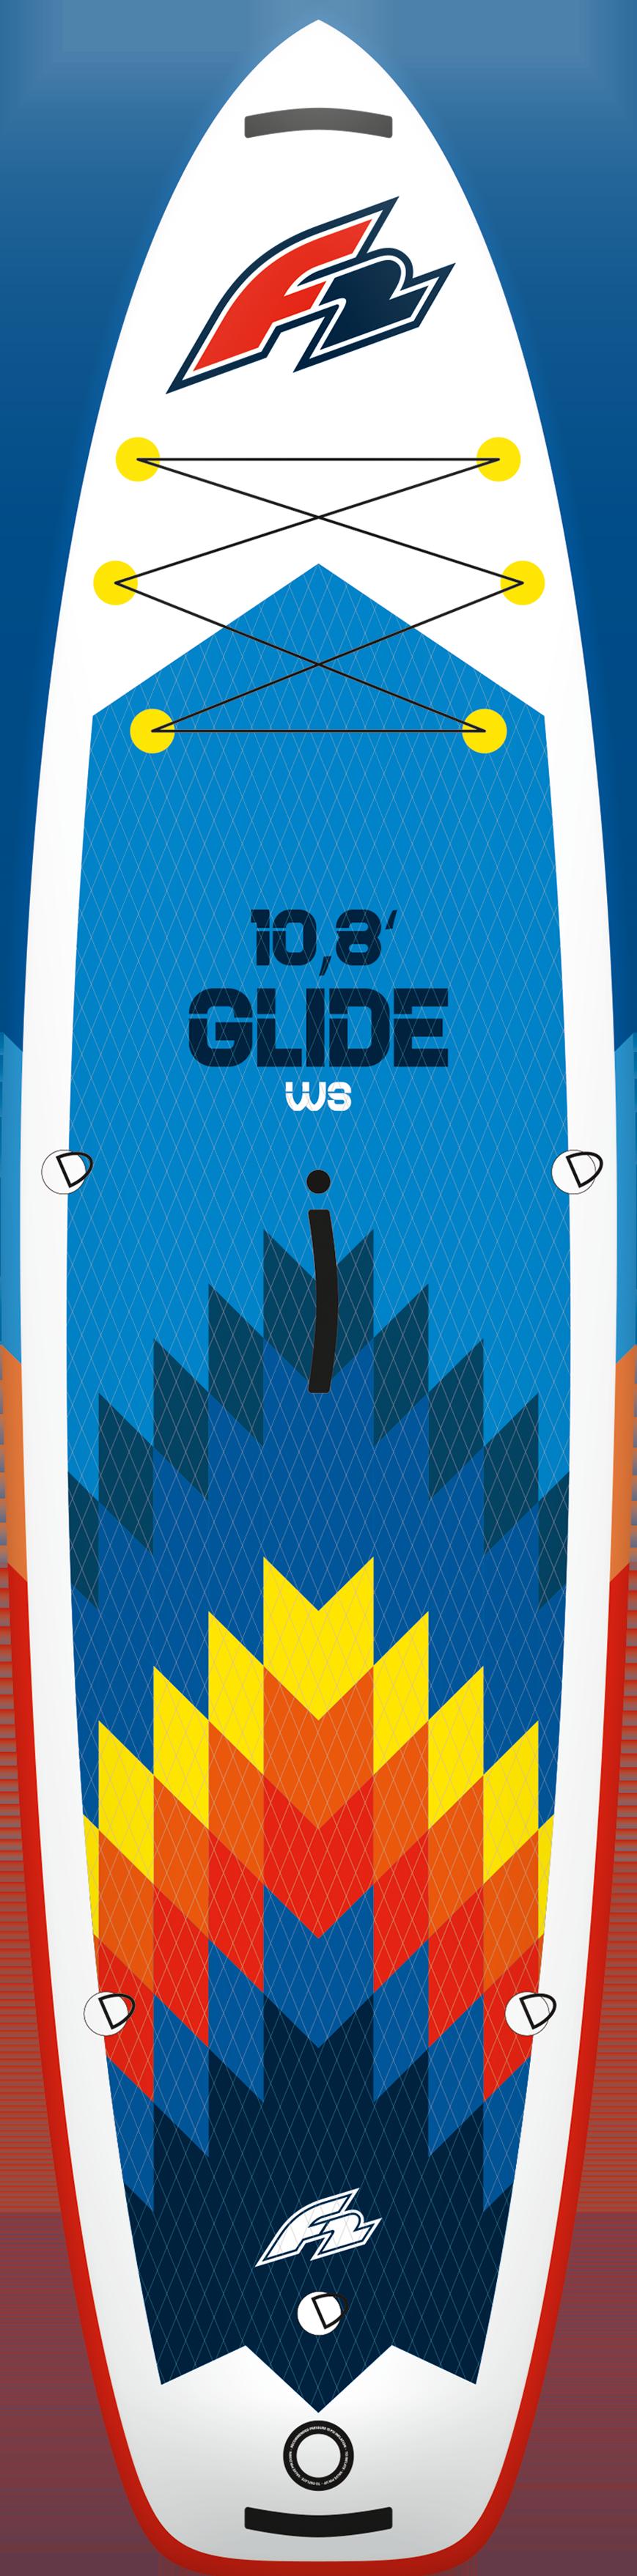 GLIDE WINDSURF - Top